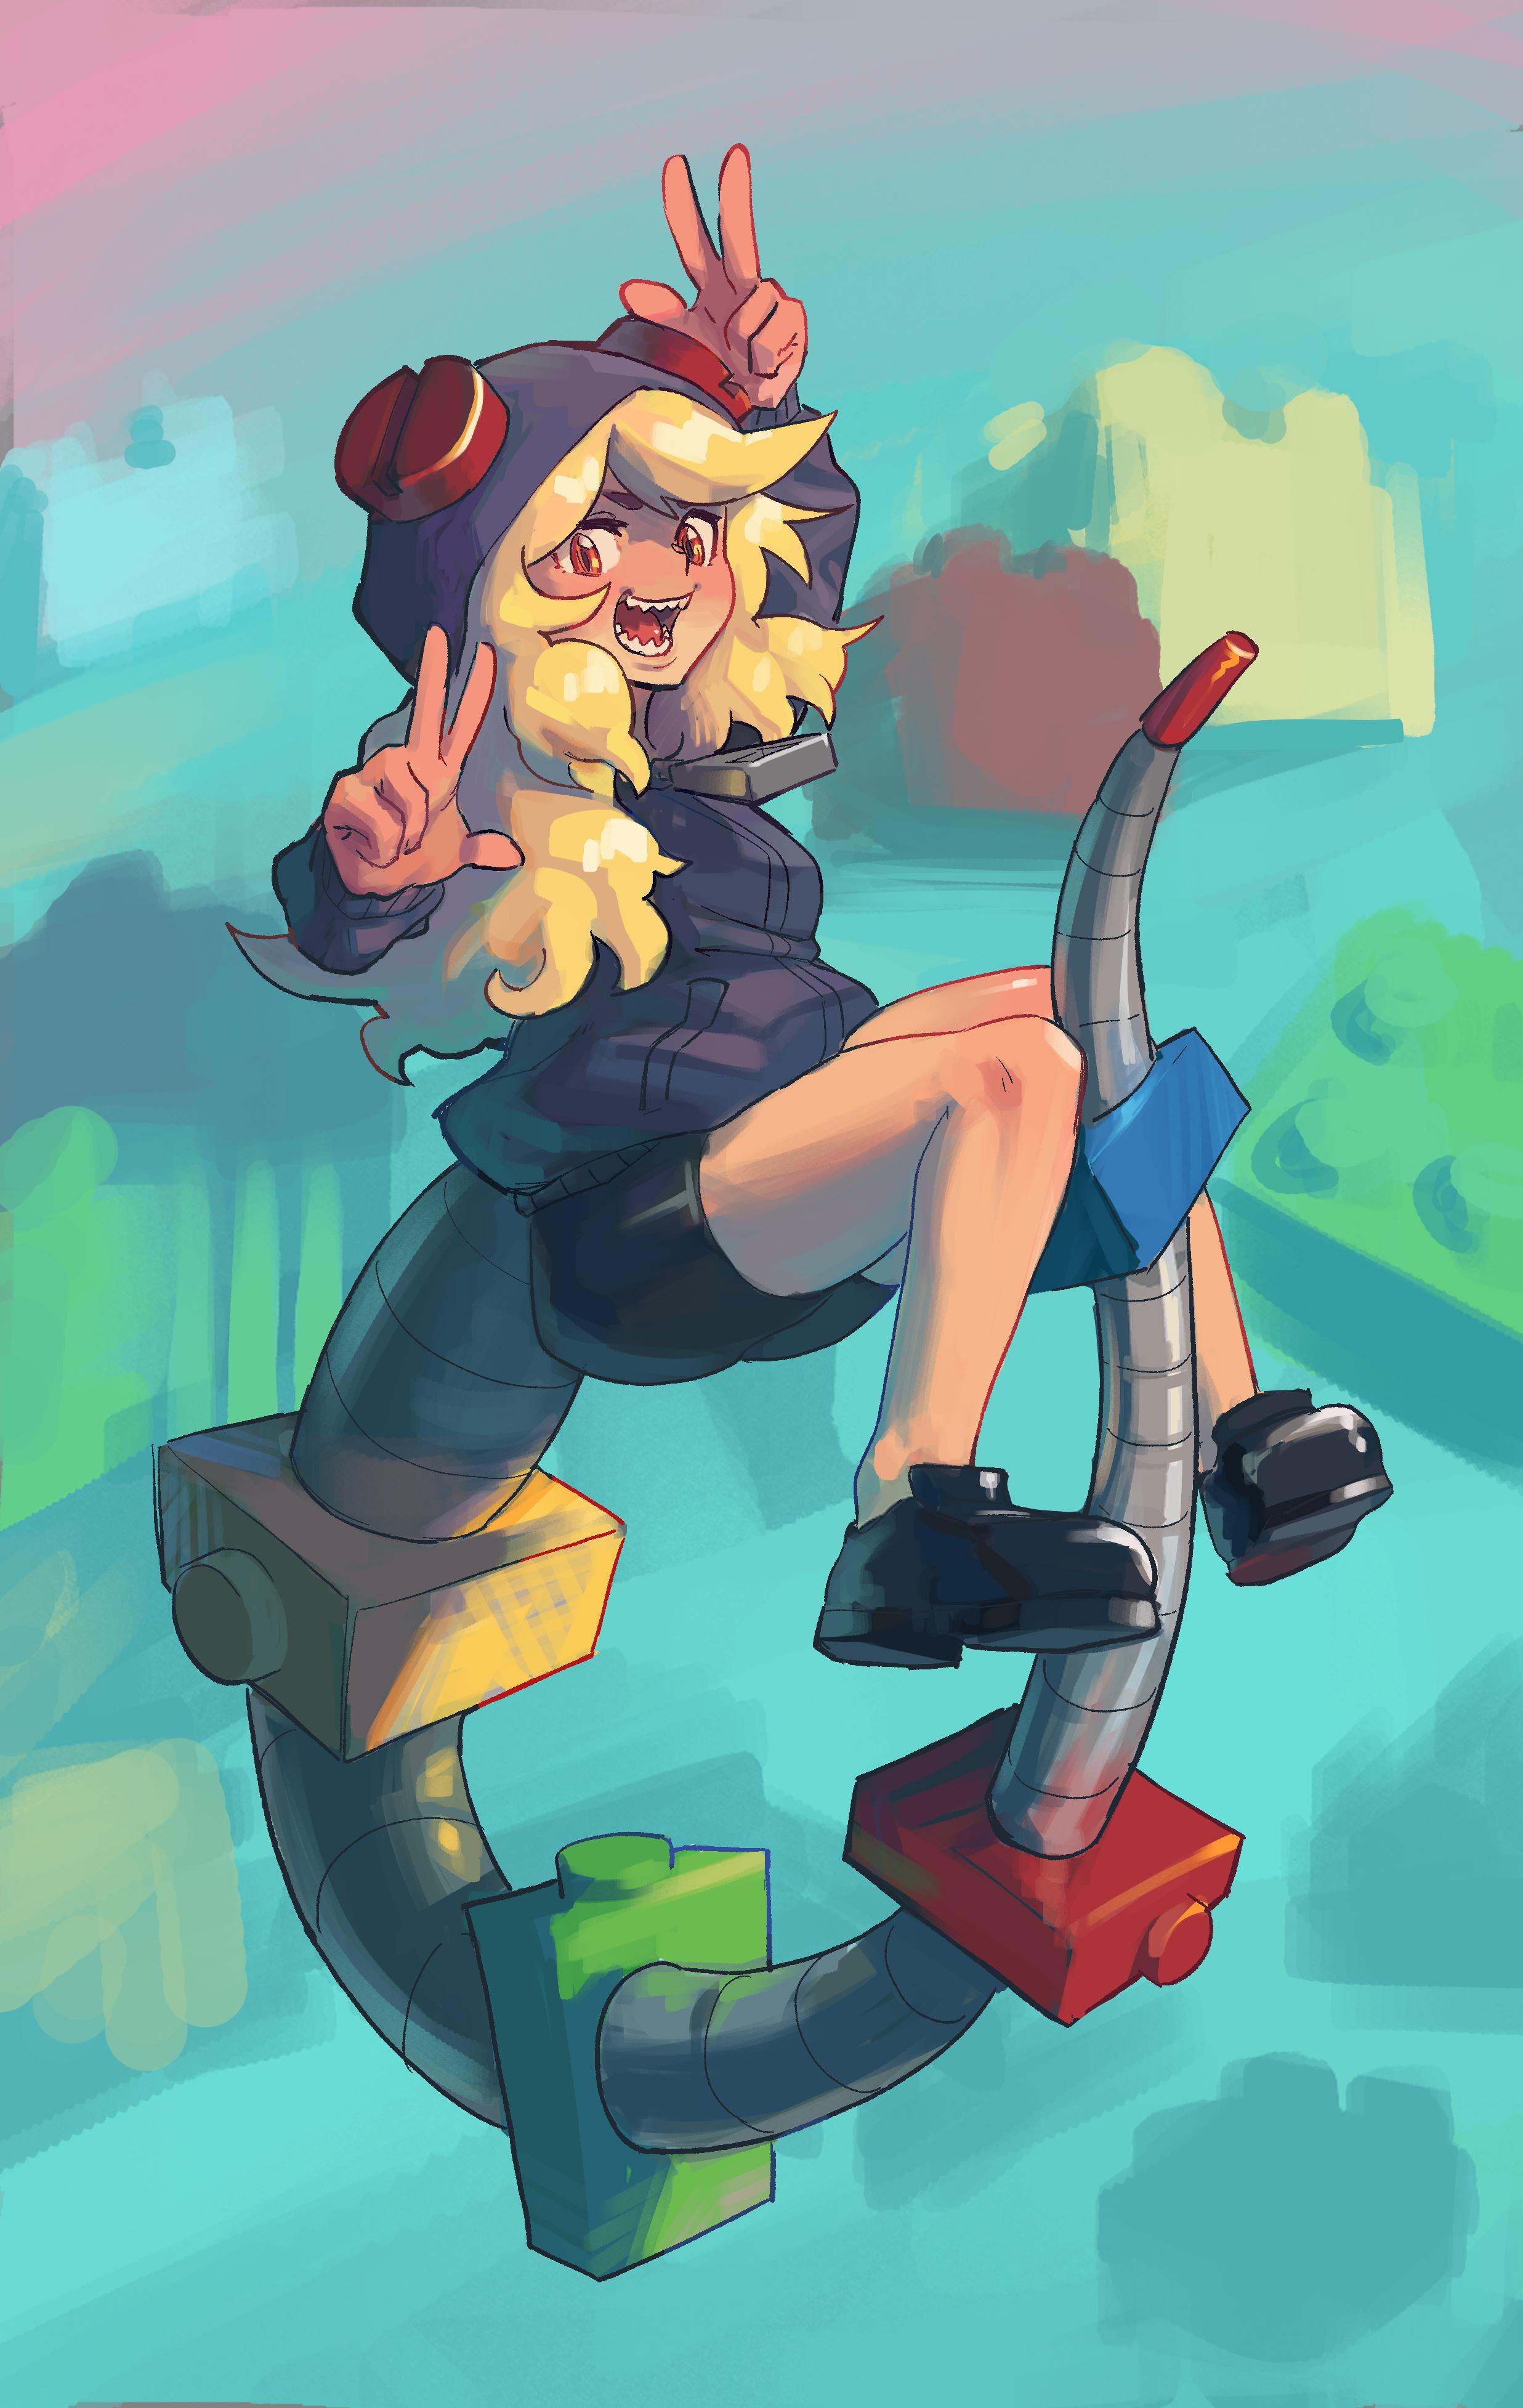 Block-chan